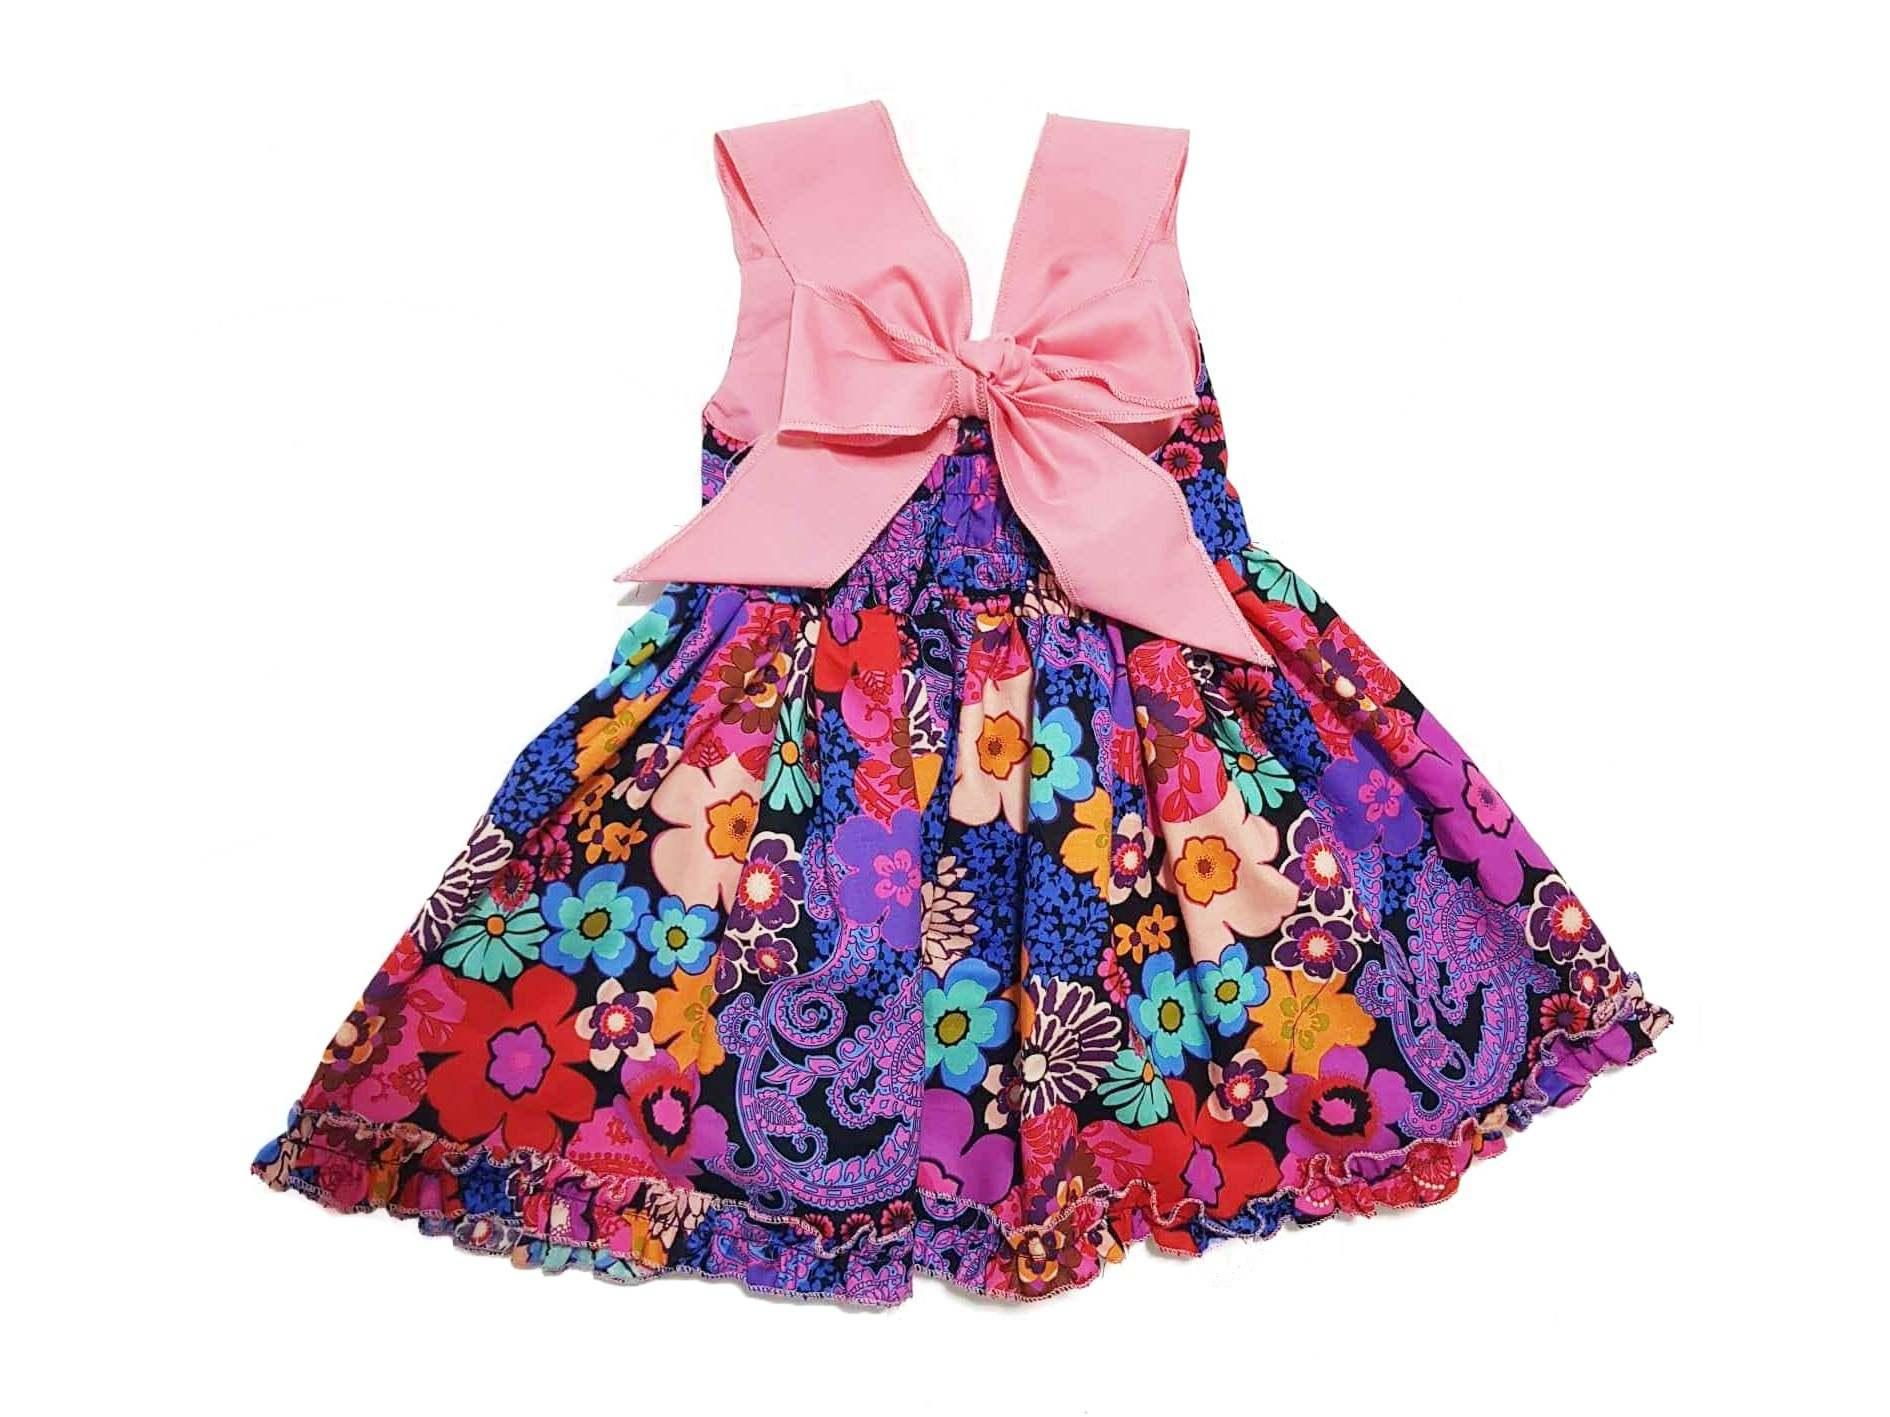 Ihram Kids For Sale Dubai: Baby Clothing Online Brands